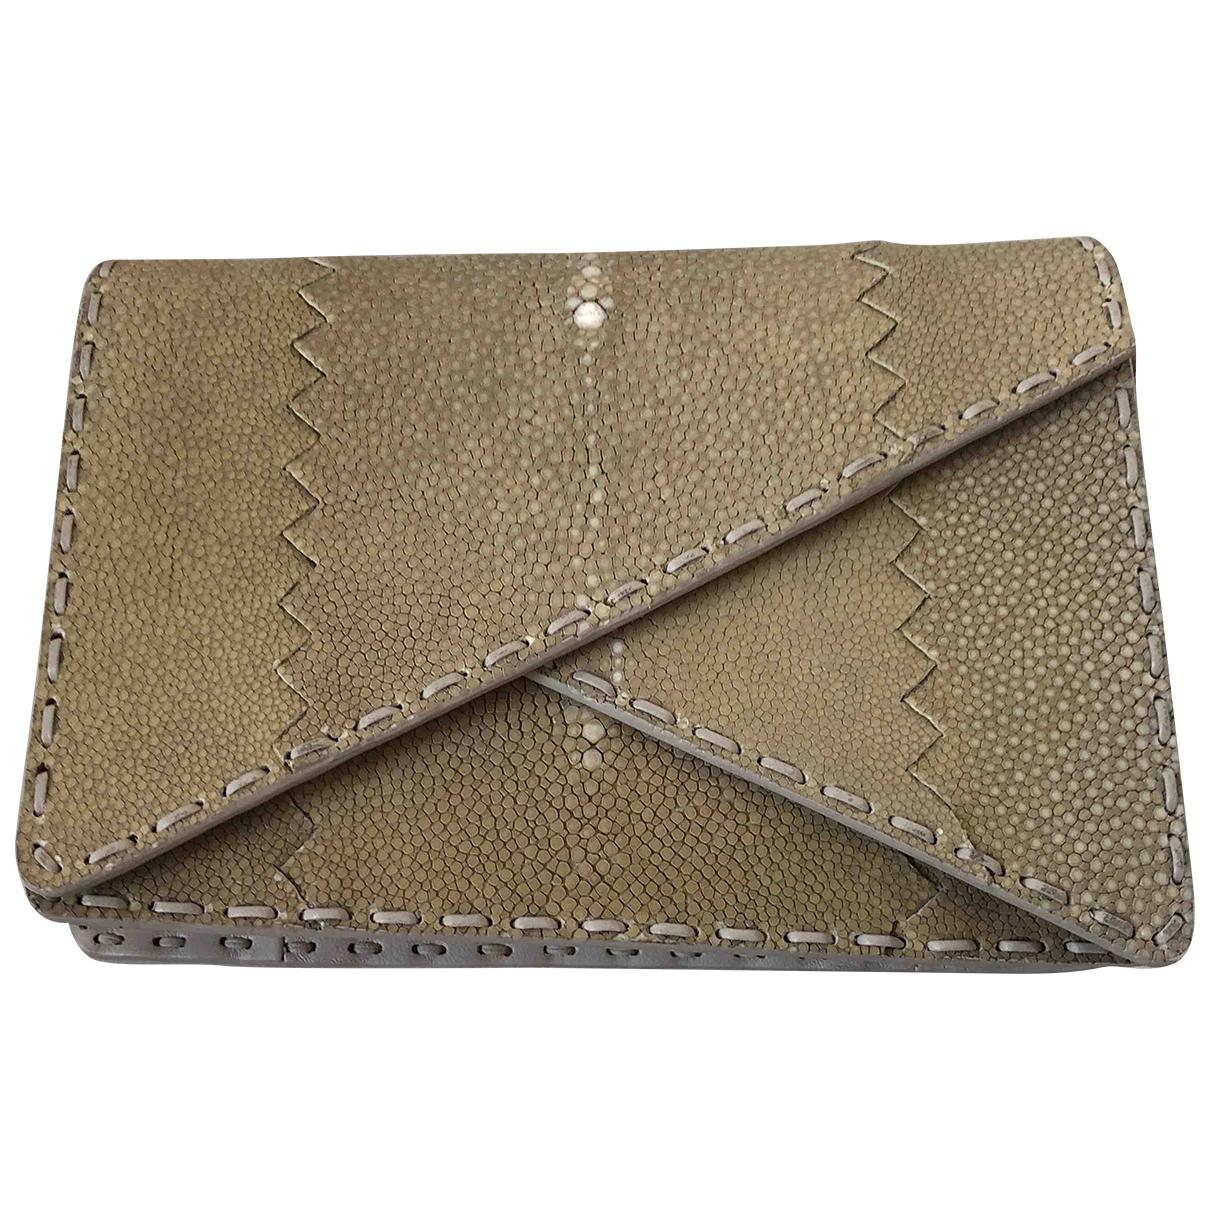 Bottega Veneta \N Beige Stingray Clutch bag for Women \N